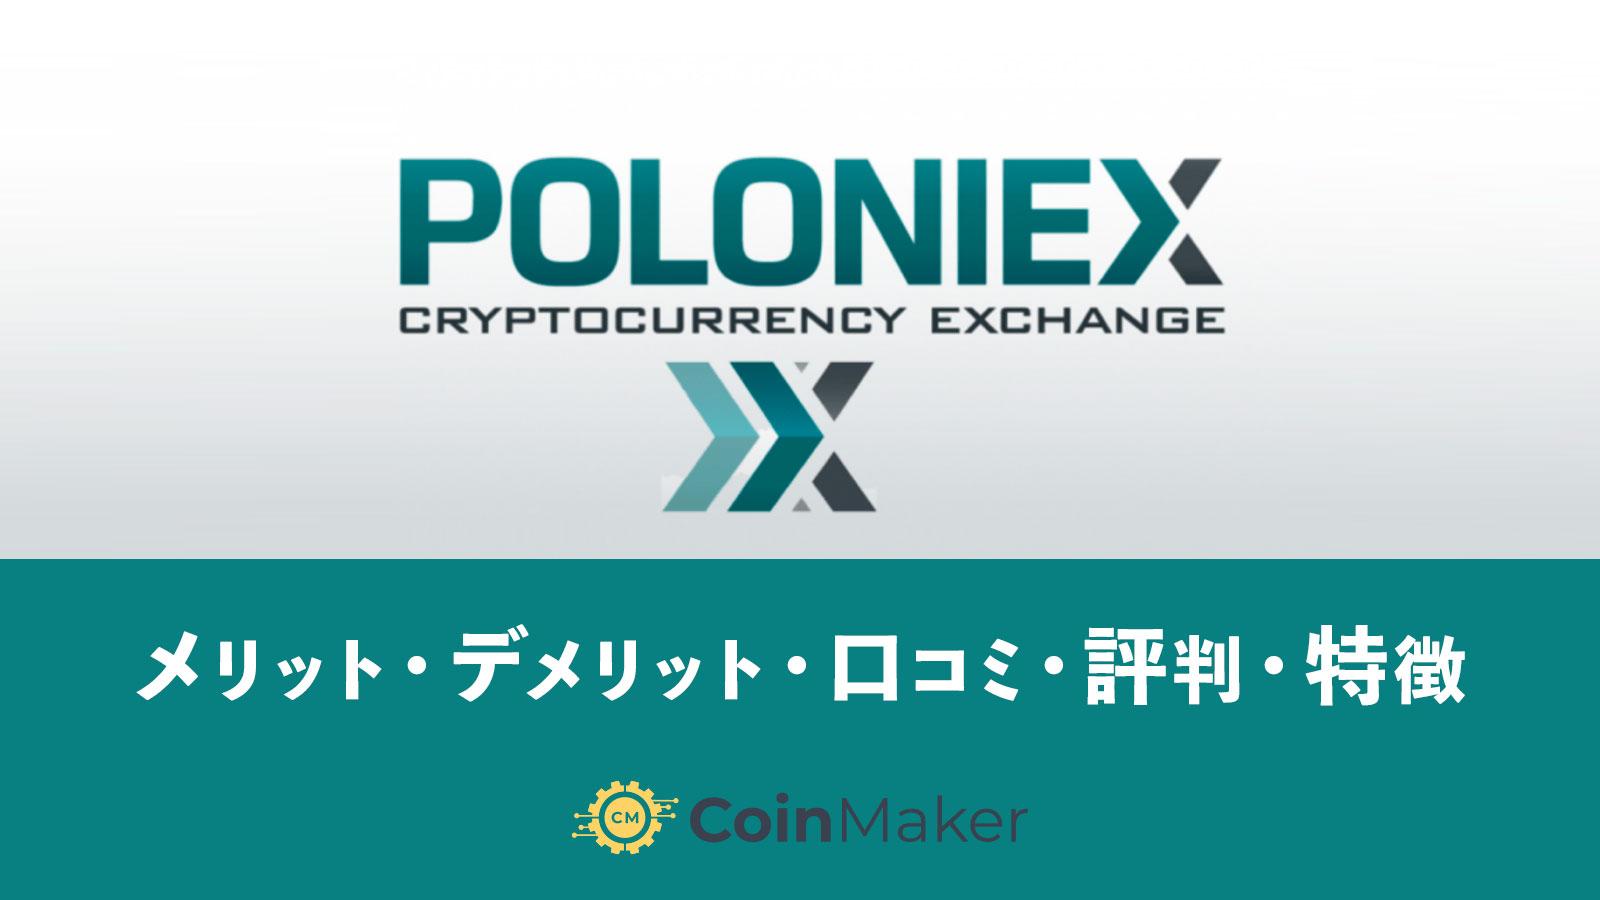 Poloniex(ポロニエックス)特徴・評判をわかりやすく解説